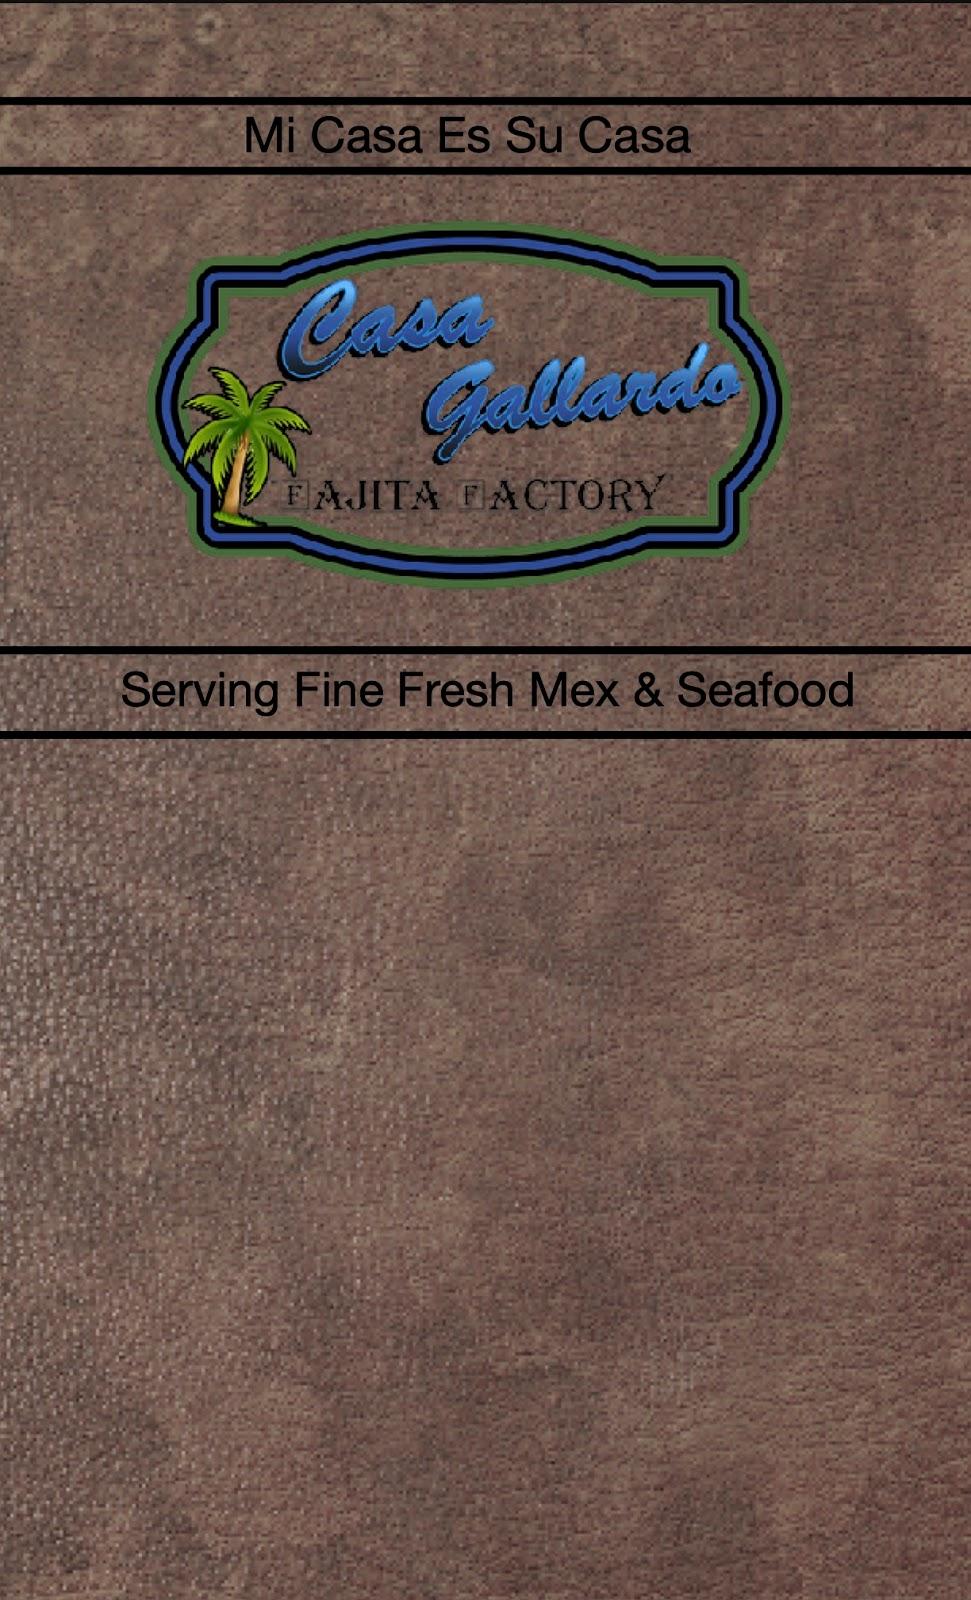 Casa Gallardo Fajita Factory   restaurant   625 Mt Clinton Pike, Harrisonburg, VA 22802, USA   5402098198 OR +1 540-209-8198